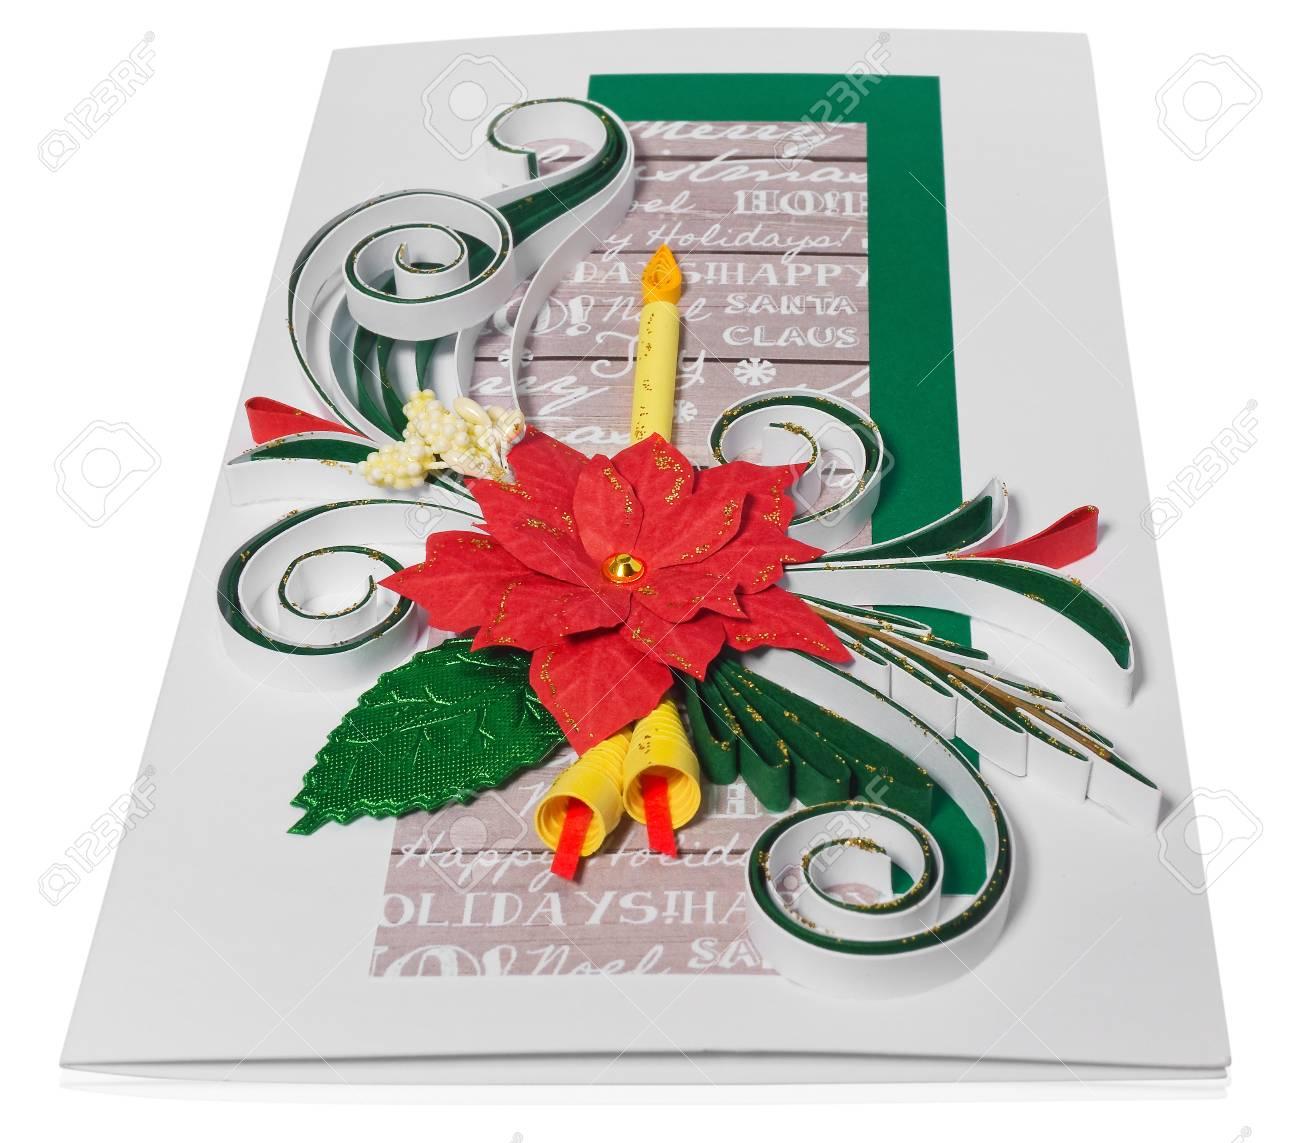 Christmas Greeting Cards Handmade.Handmade Christmas Card Postcard With Merry Christmas Greetings